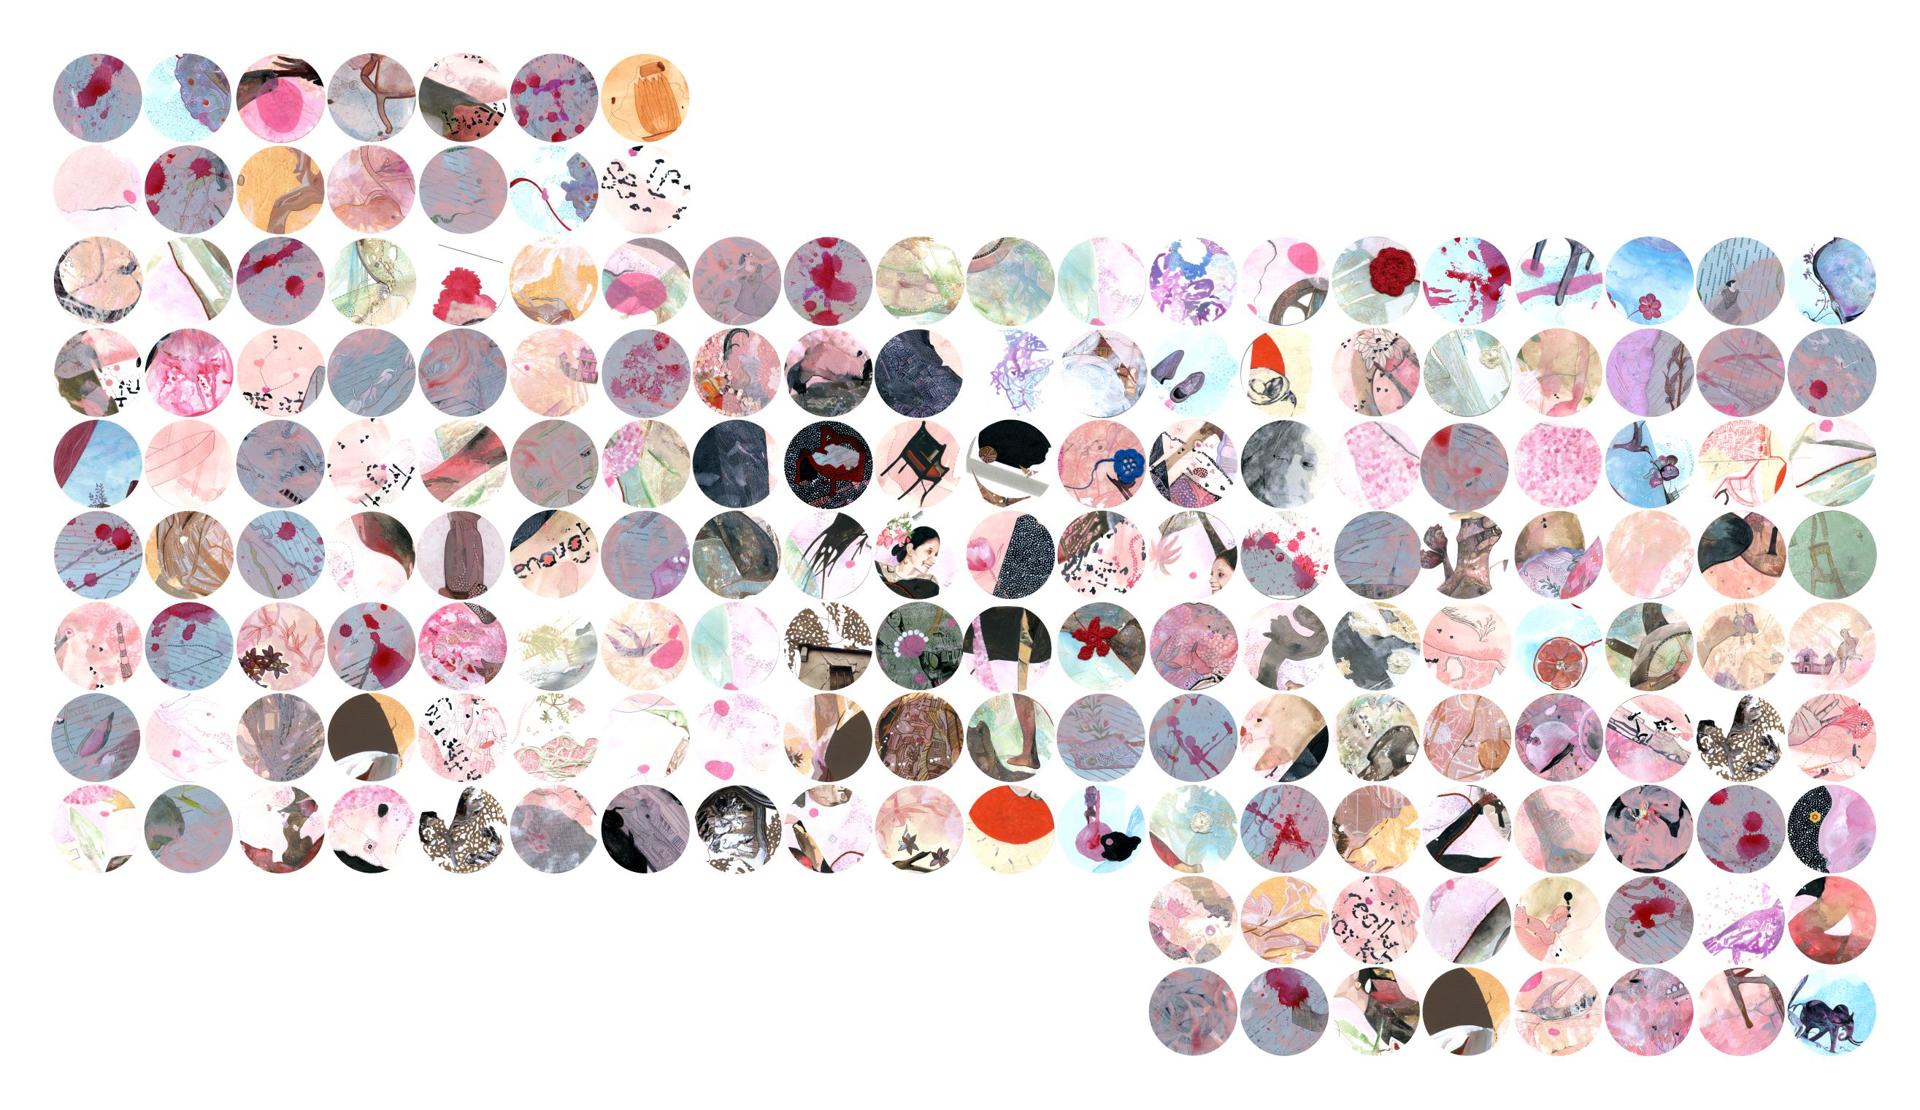 Full Stop ( 170 pieces) by Ritu Sinha